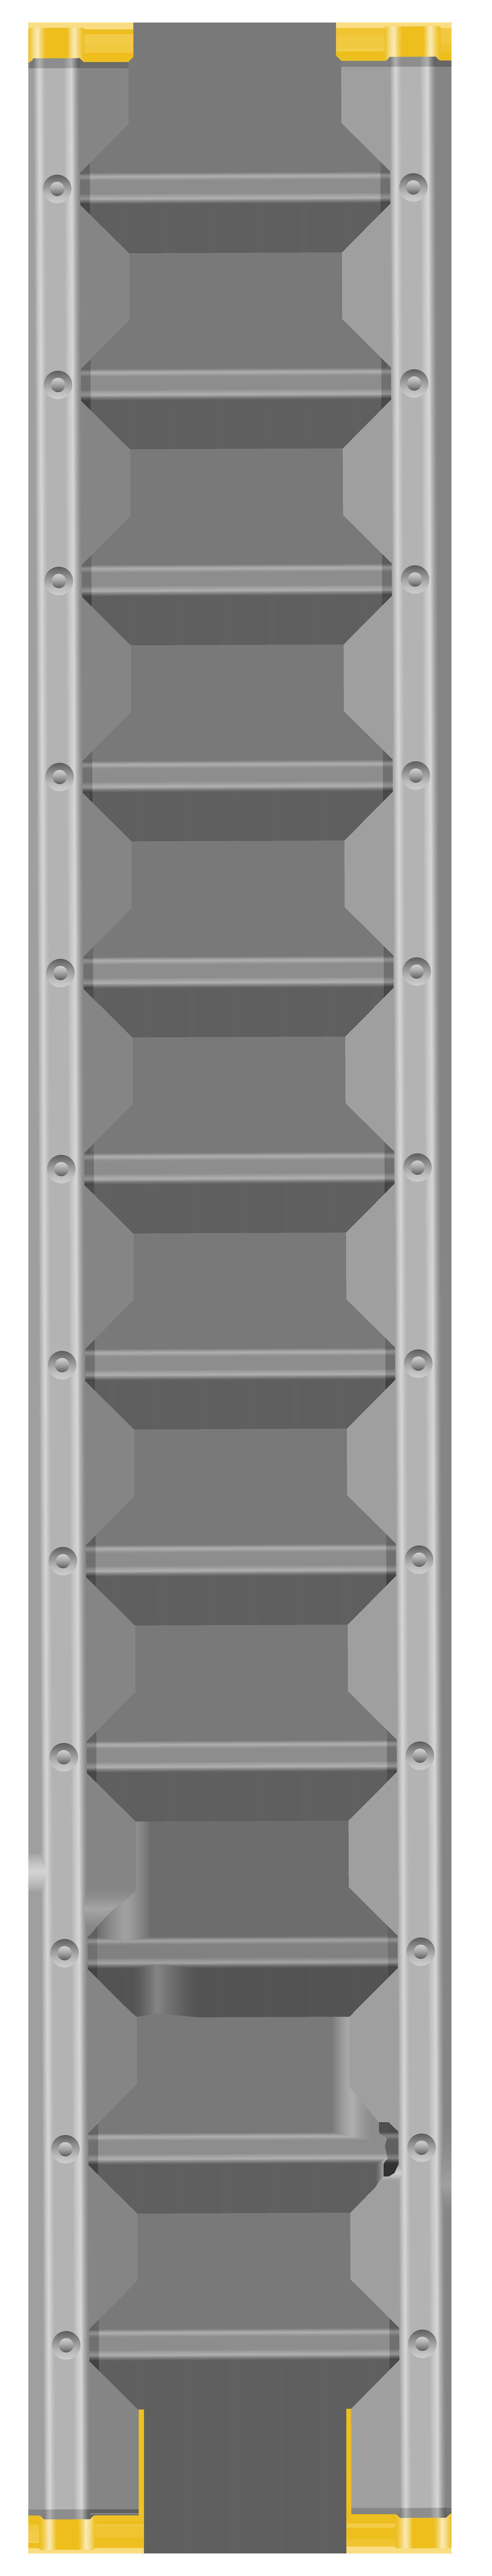 Staircase clipart tangga. Ladder png clip art